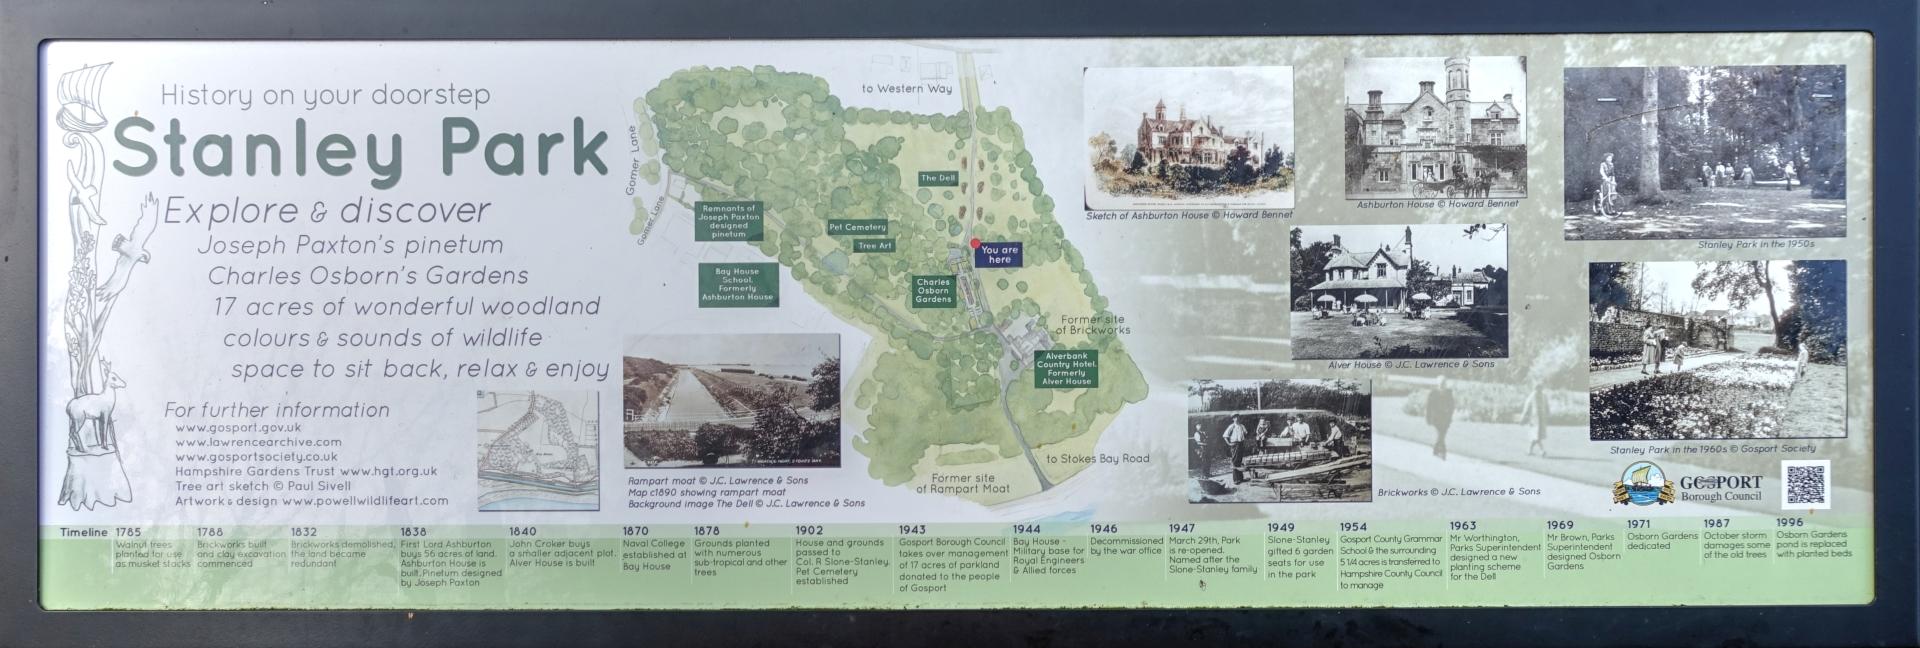 Stanley Park Information Board